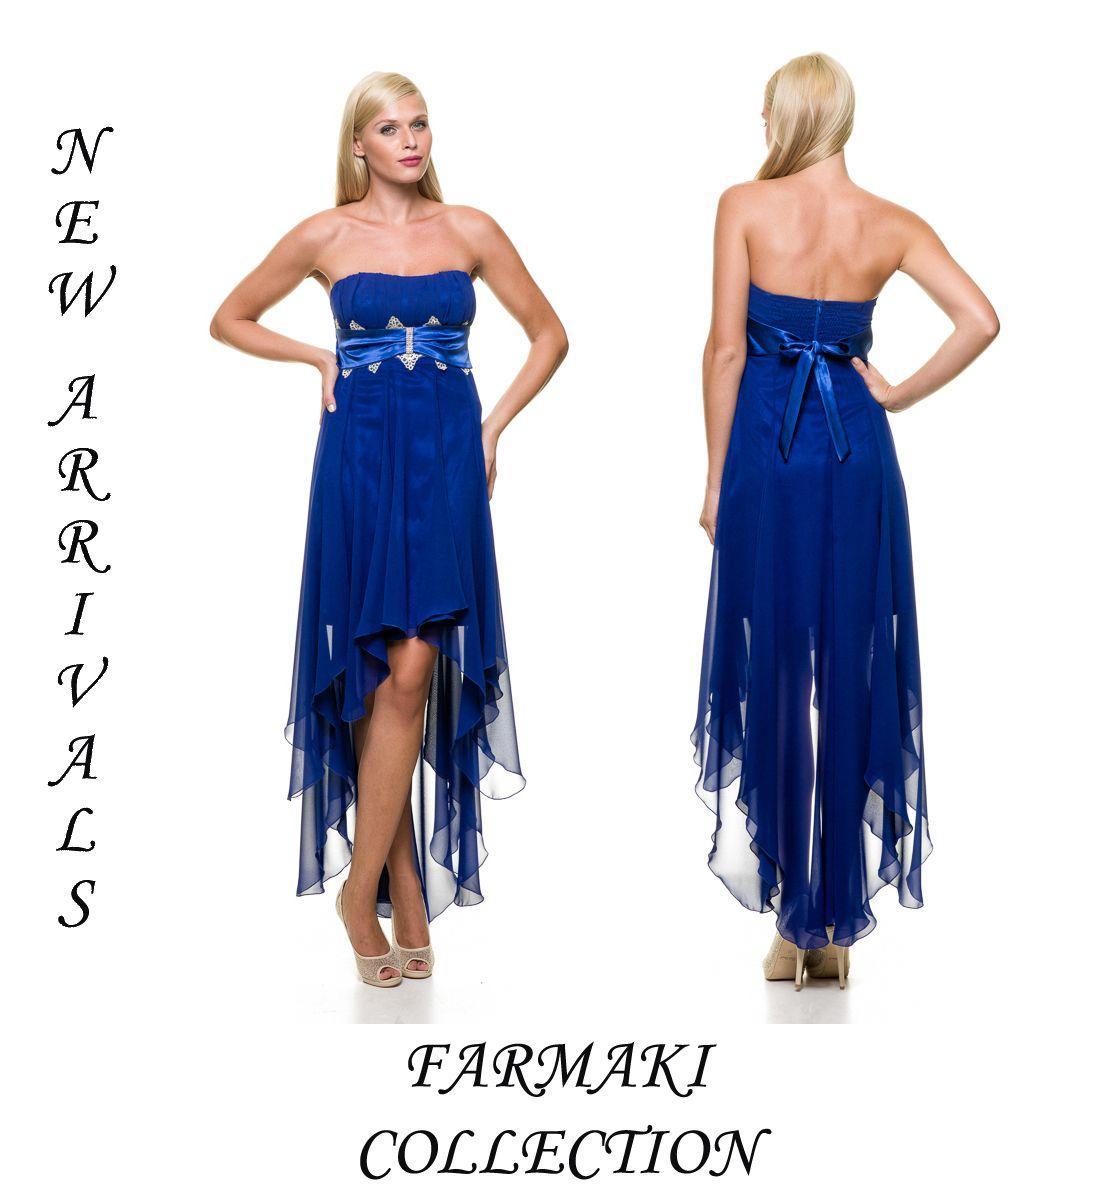 c3d34cb555c Φόρεμα ασύμετρο κοντό μπροστά, μακρύ πίσω, στράπλες ή με ράντες ...